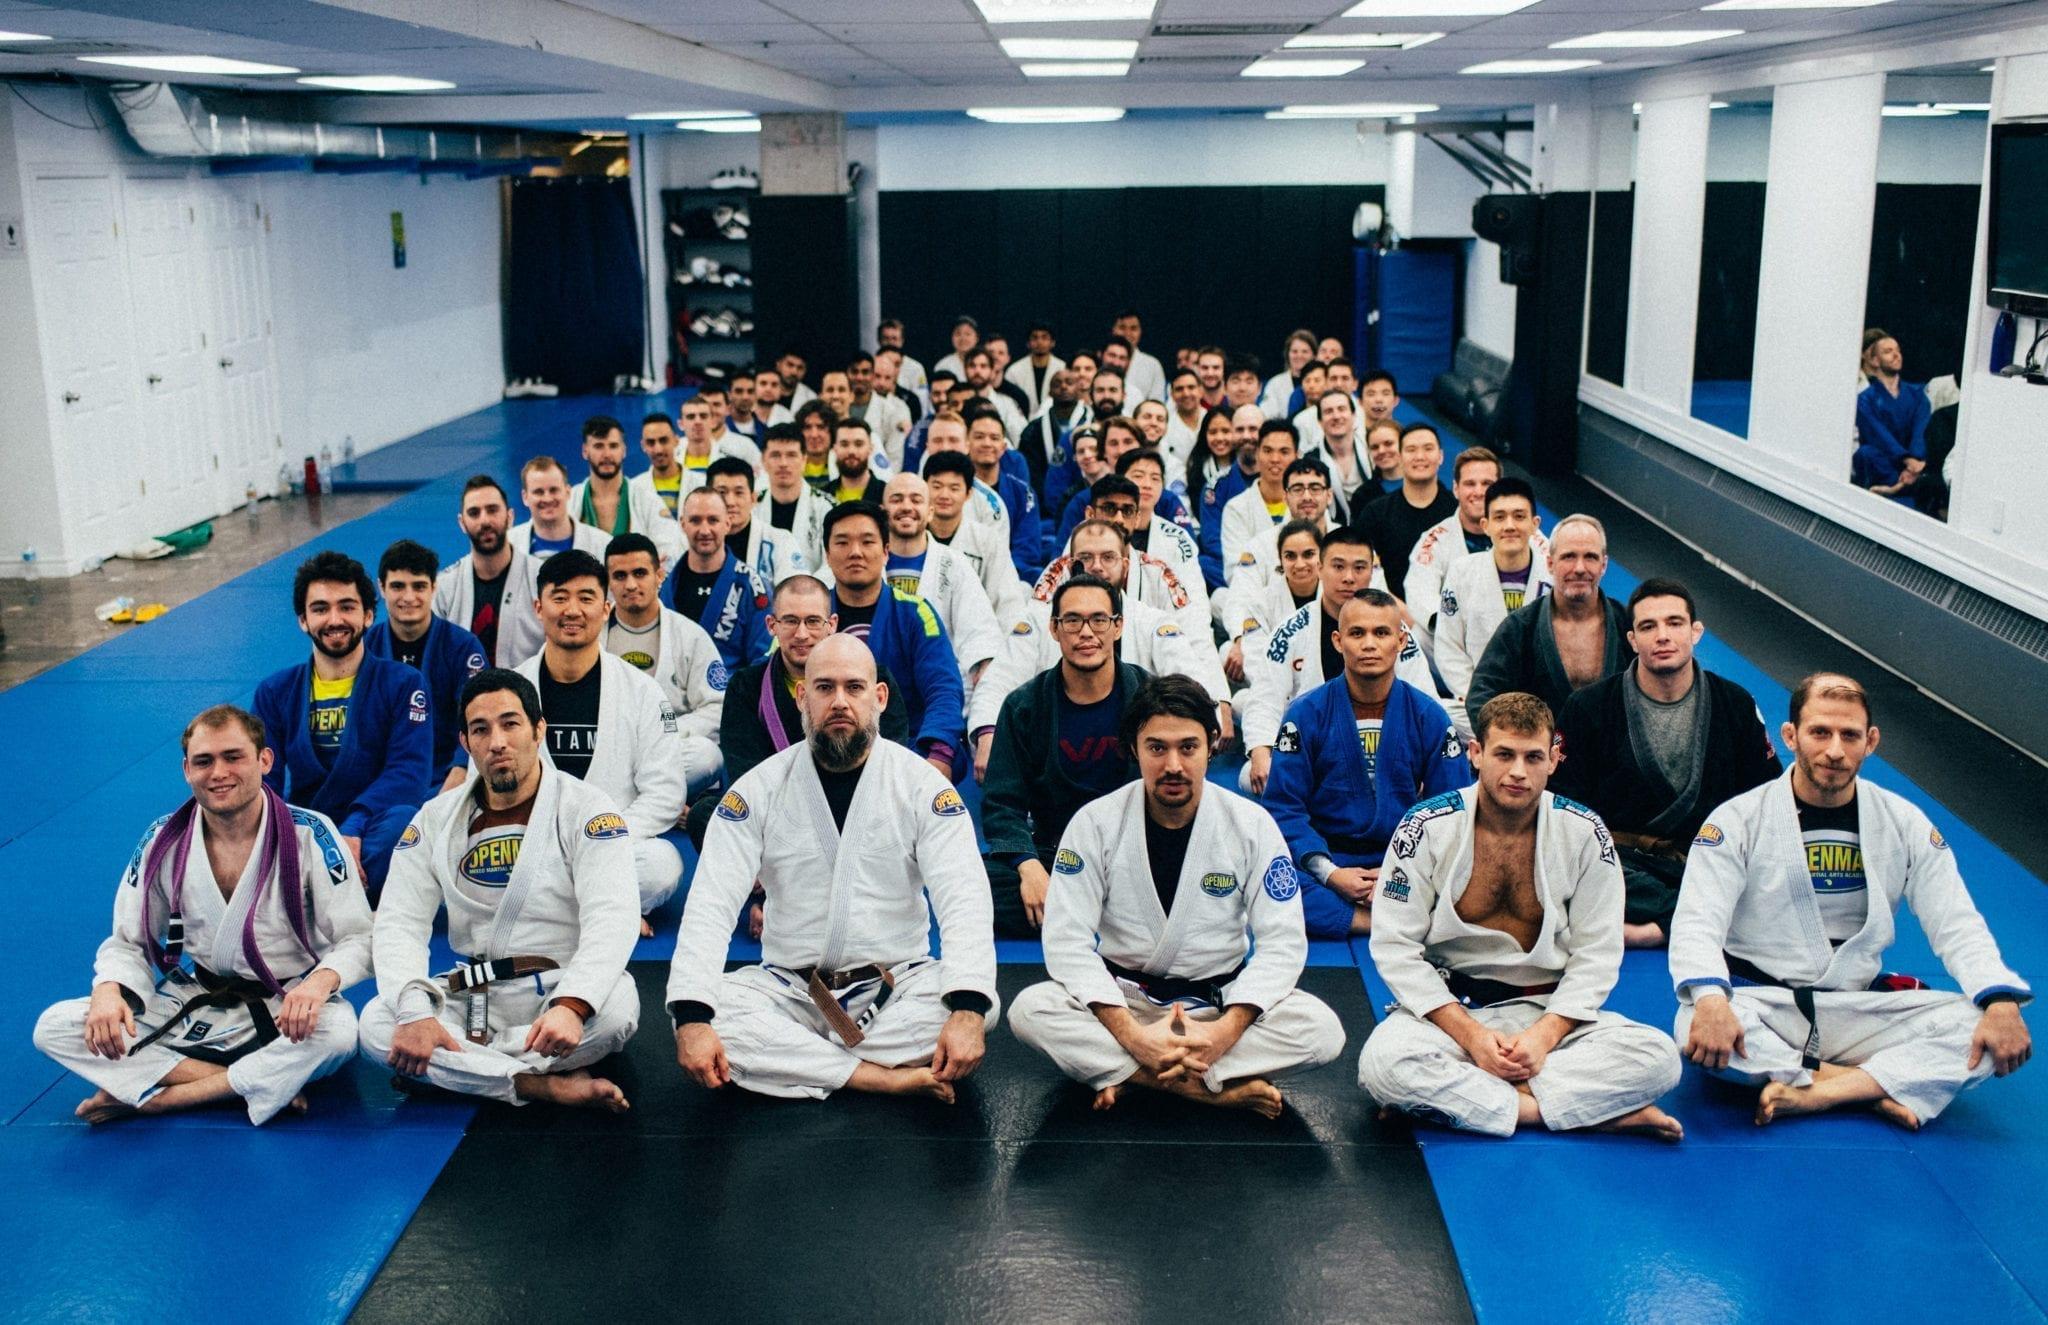 OpenMat Mixed Martial Arts | Martials Arts in Toronto | Toronto